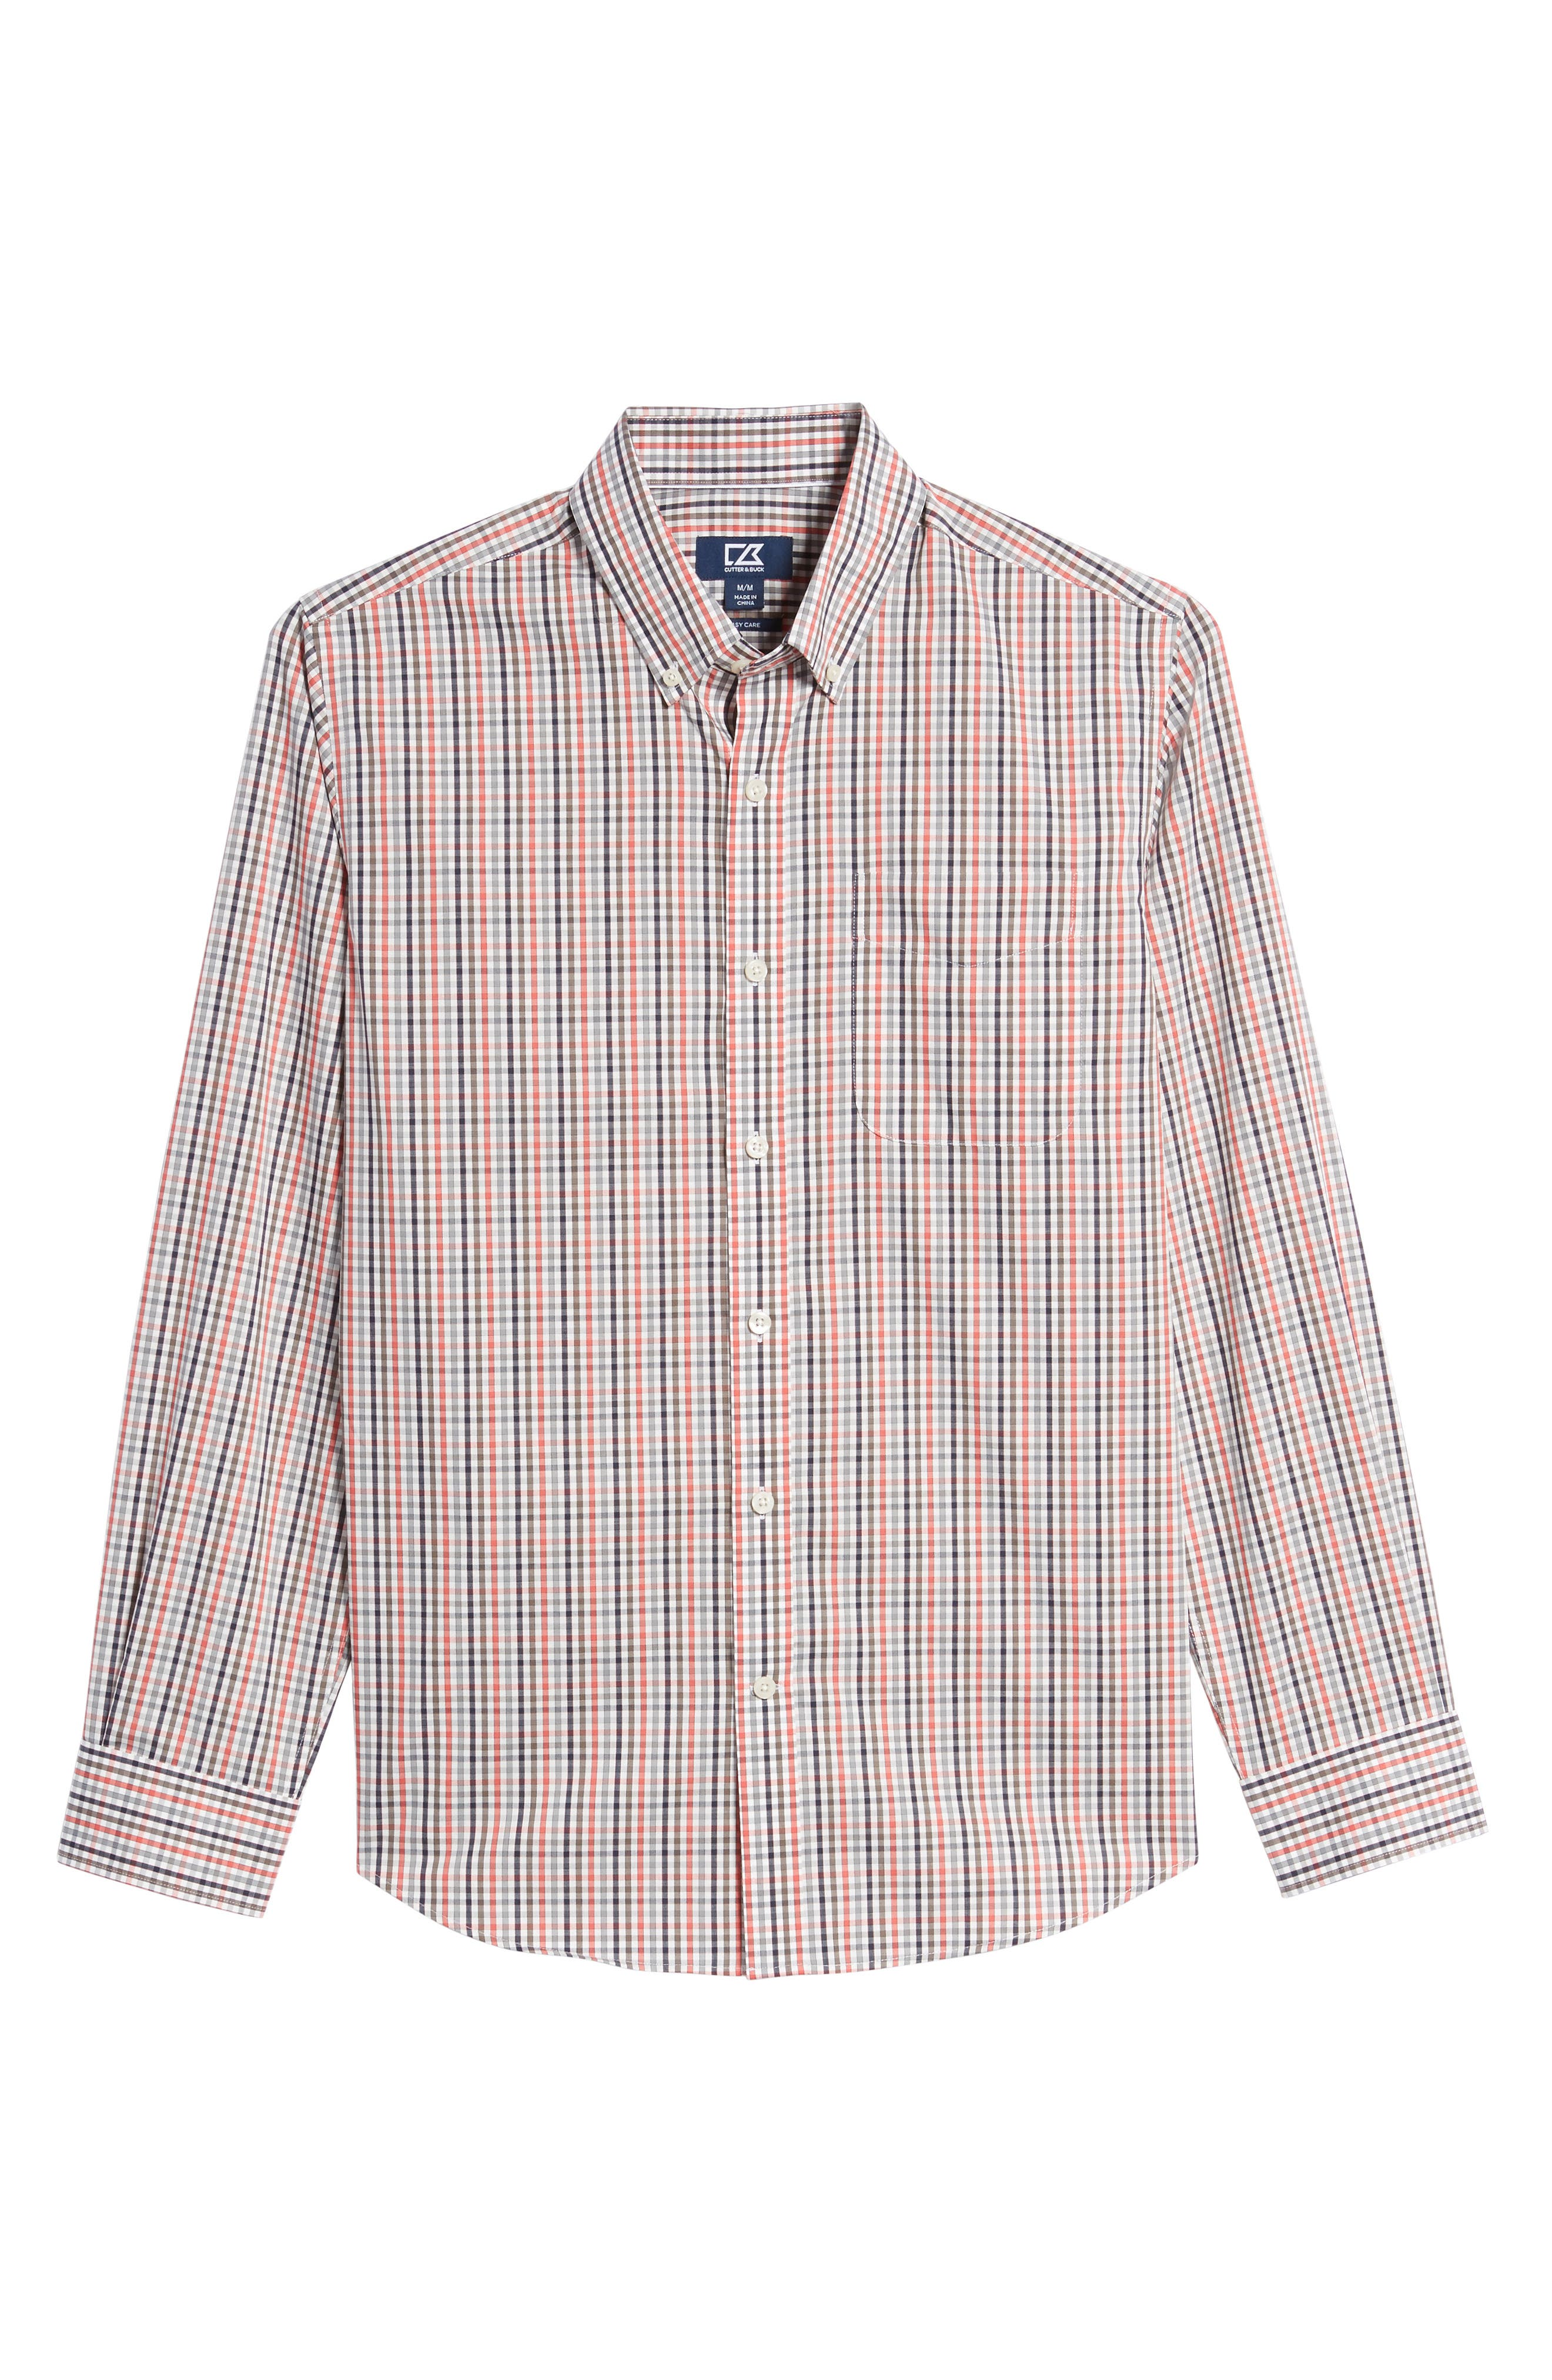 Baxter Epic Easy Care Classic Fit Plaid Sport Shirt,                             Alternate thumbnail 6, color,                             622